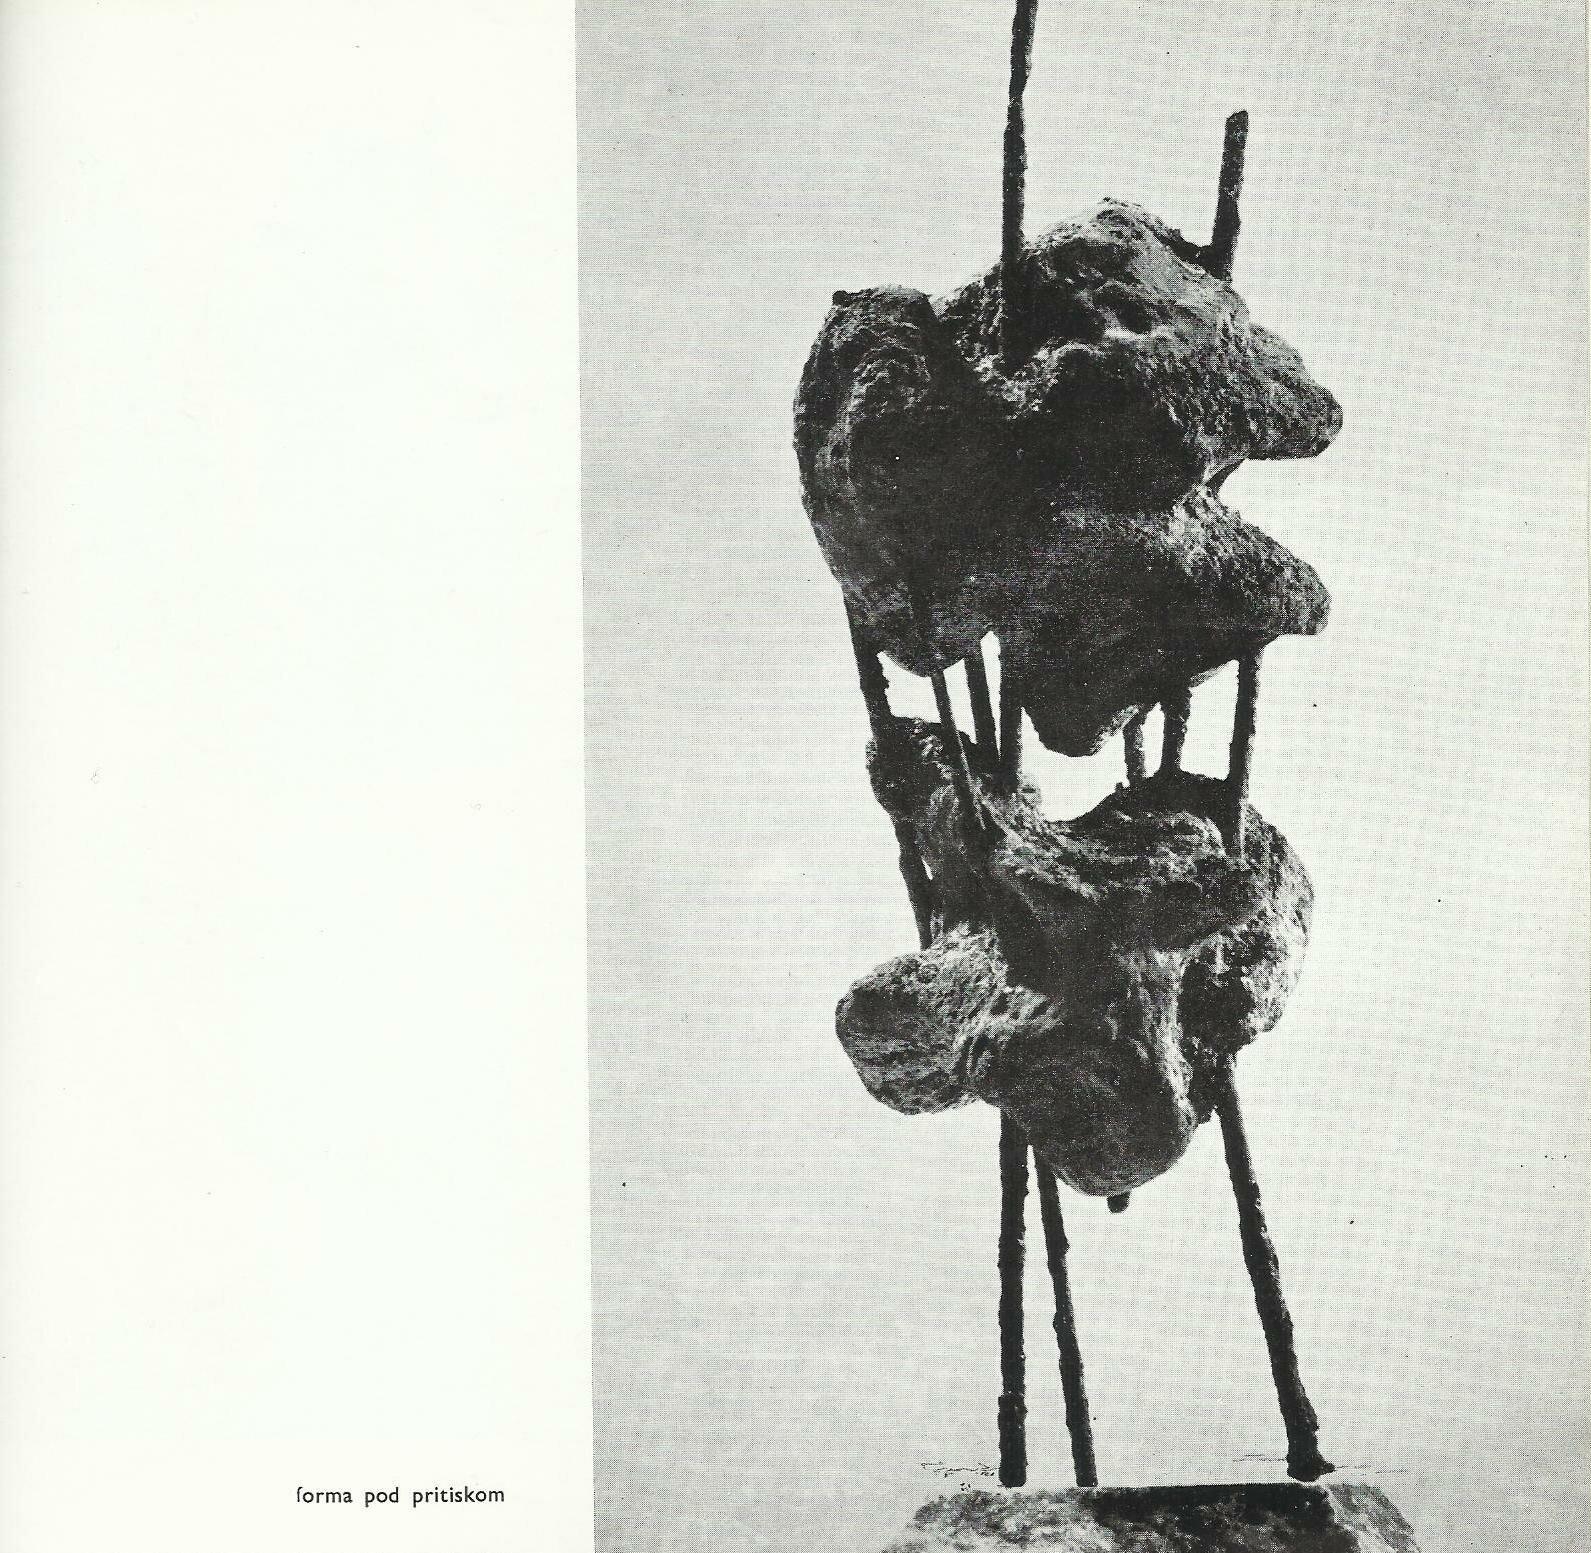 Olga_Jevrić,_Forma_pod_pritiskom,_oksid_gvožđa,_1963.